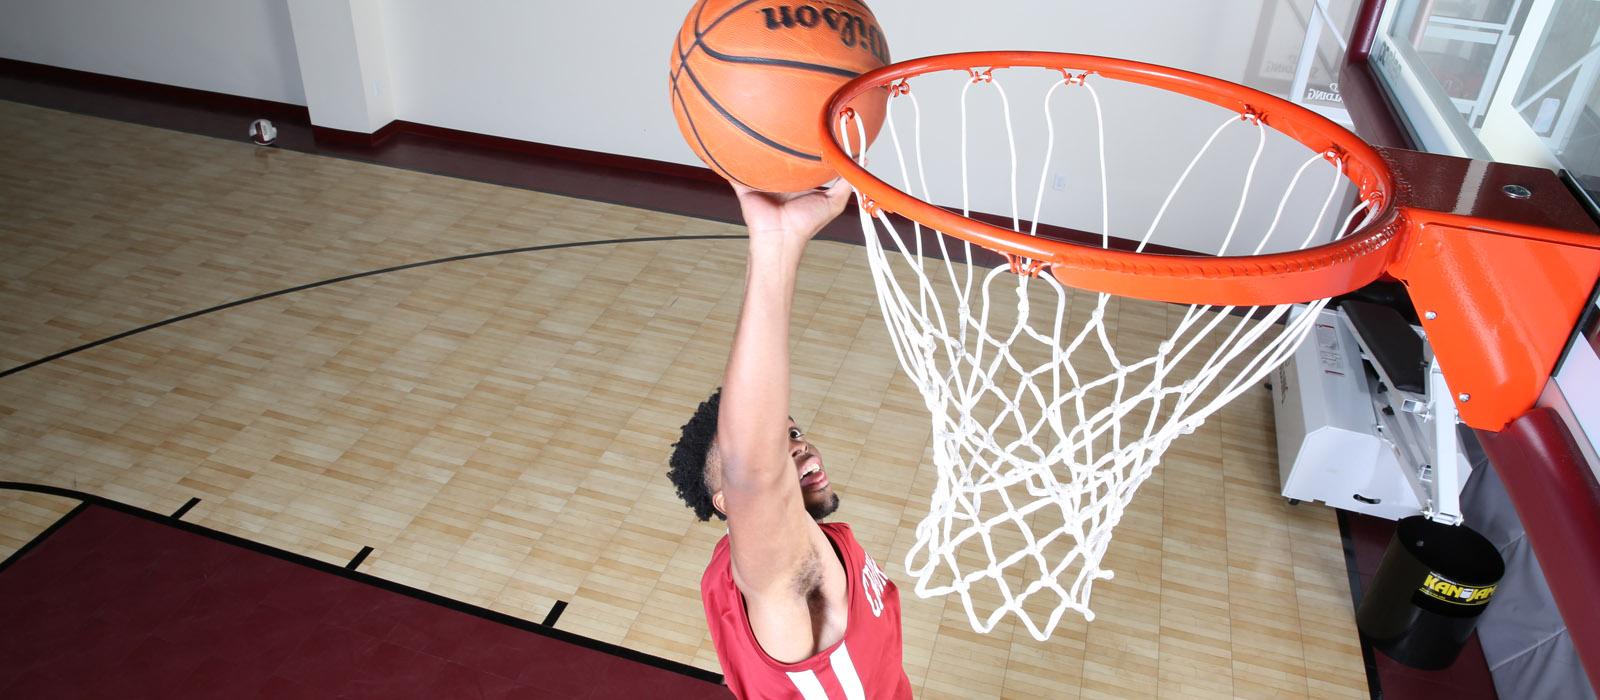 Cornerstone basketball dunk